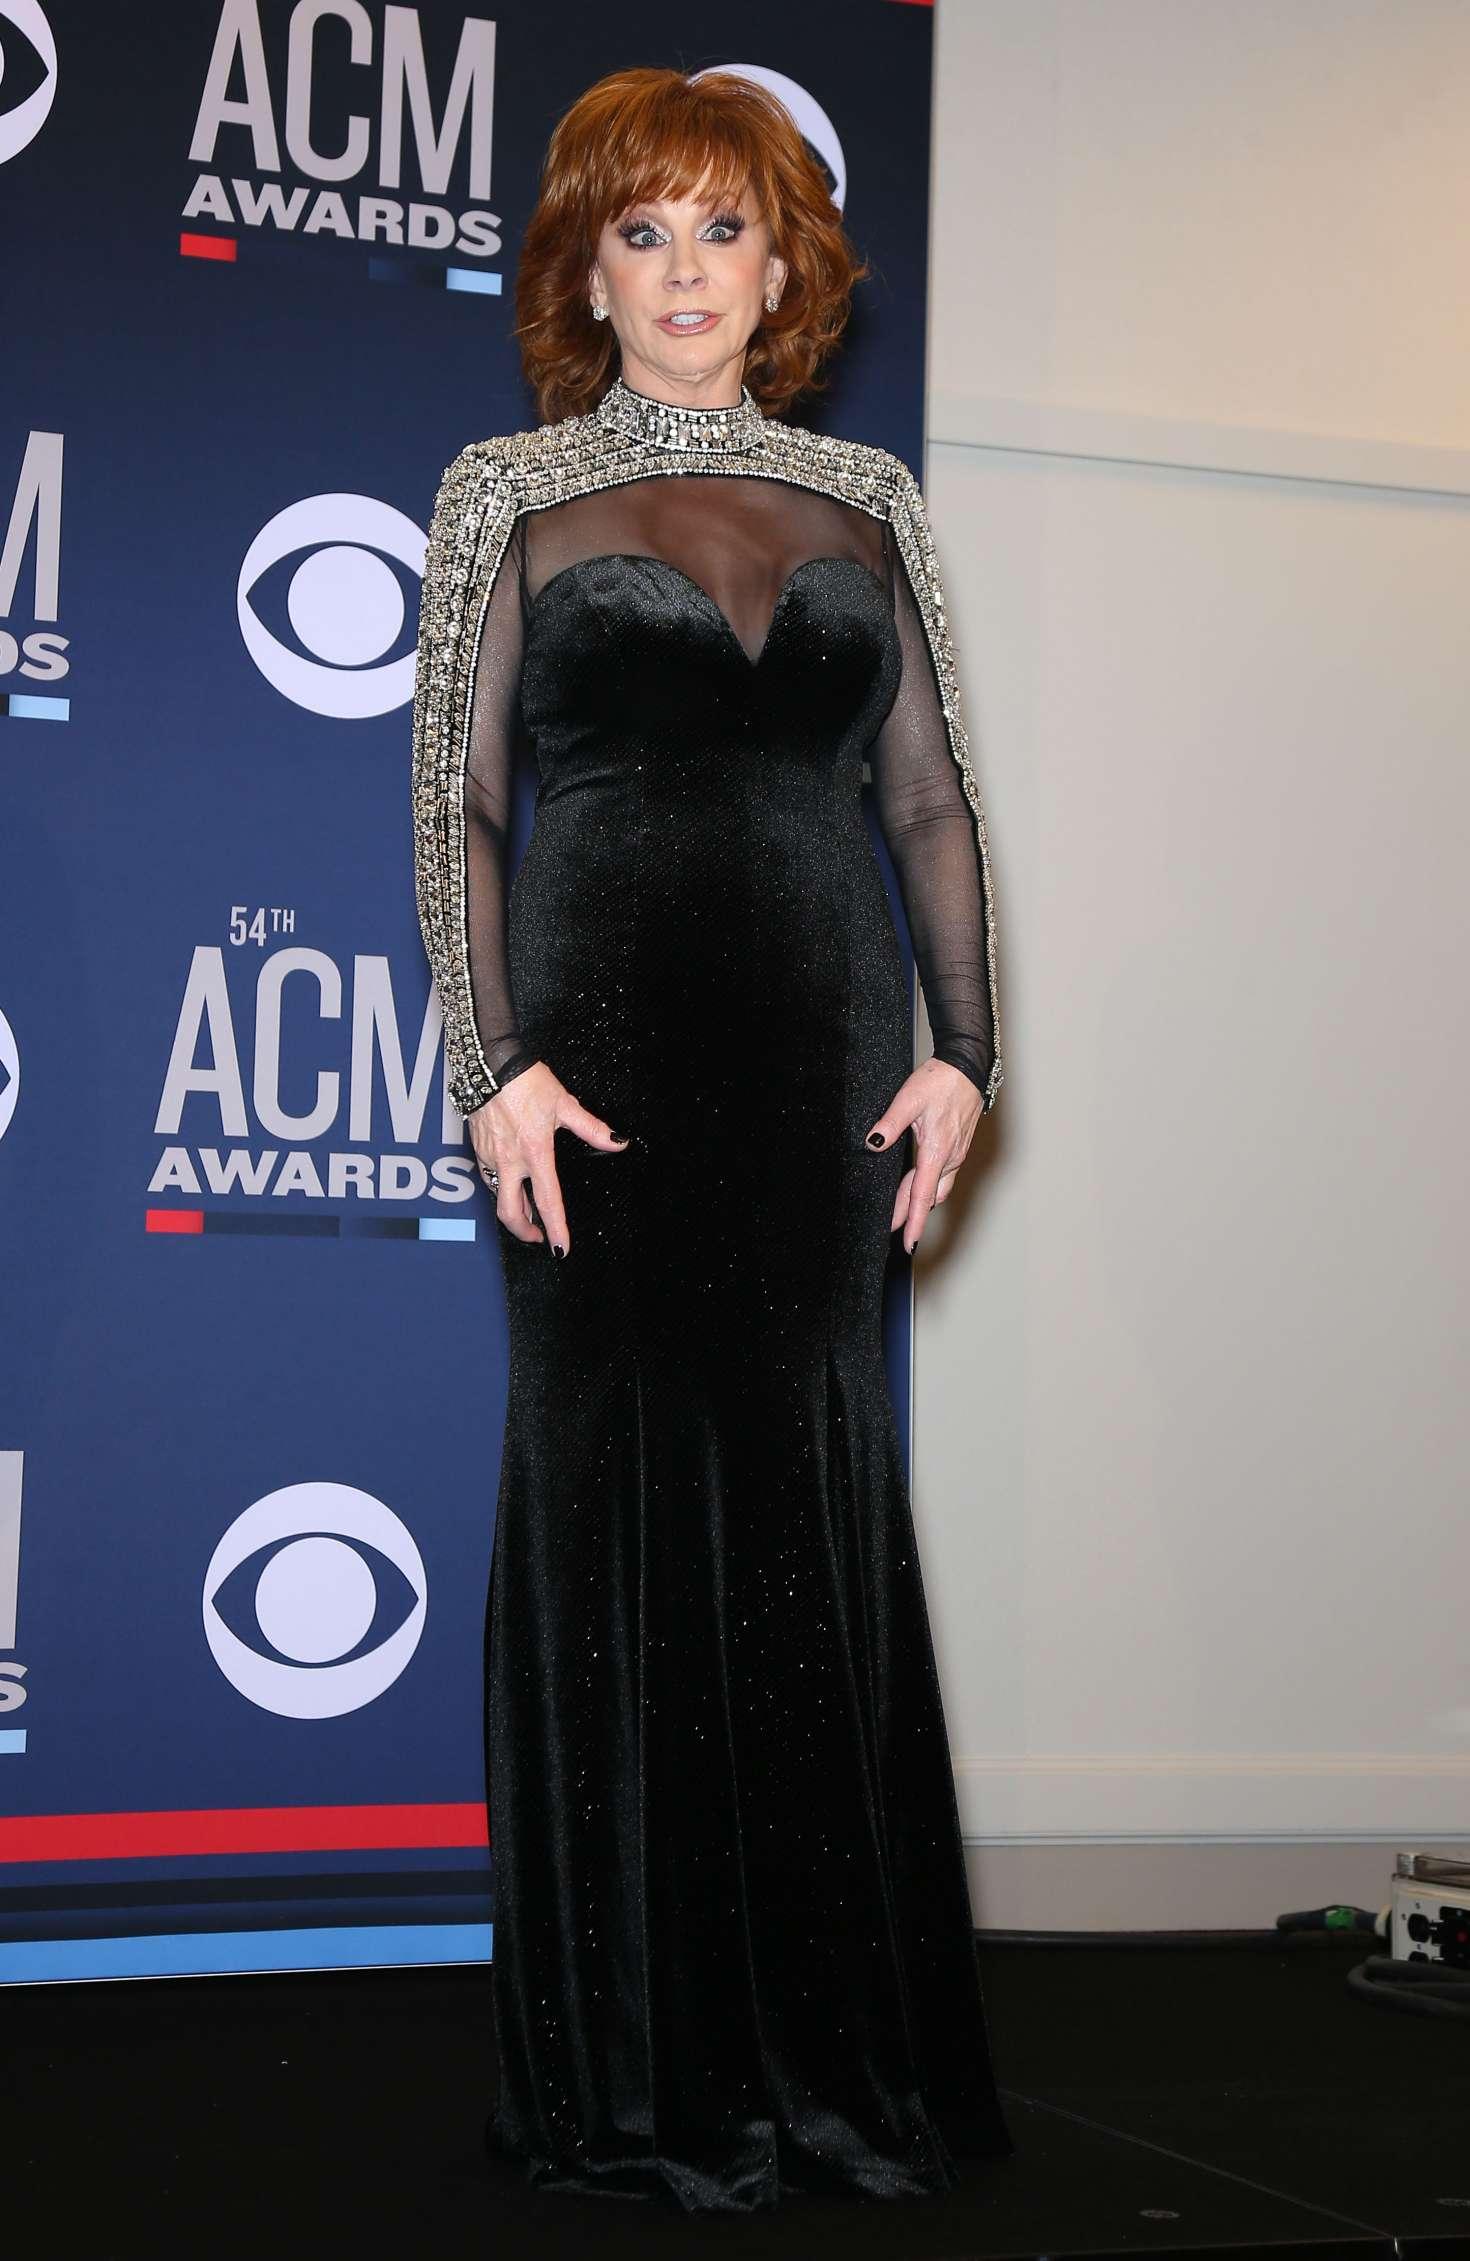 Reba Mcentire 2019 : Reba McEntire: 2019 Academy of Country Music Awards -07